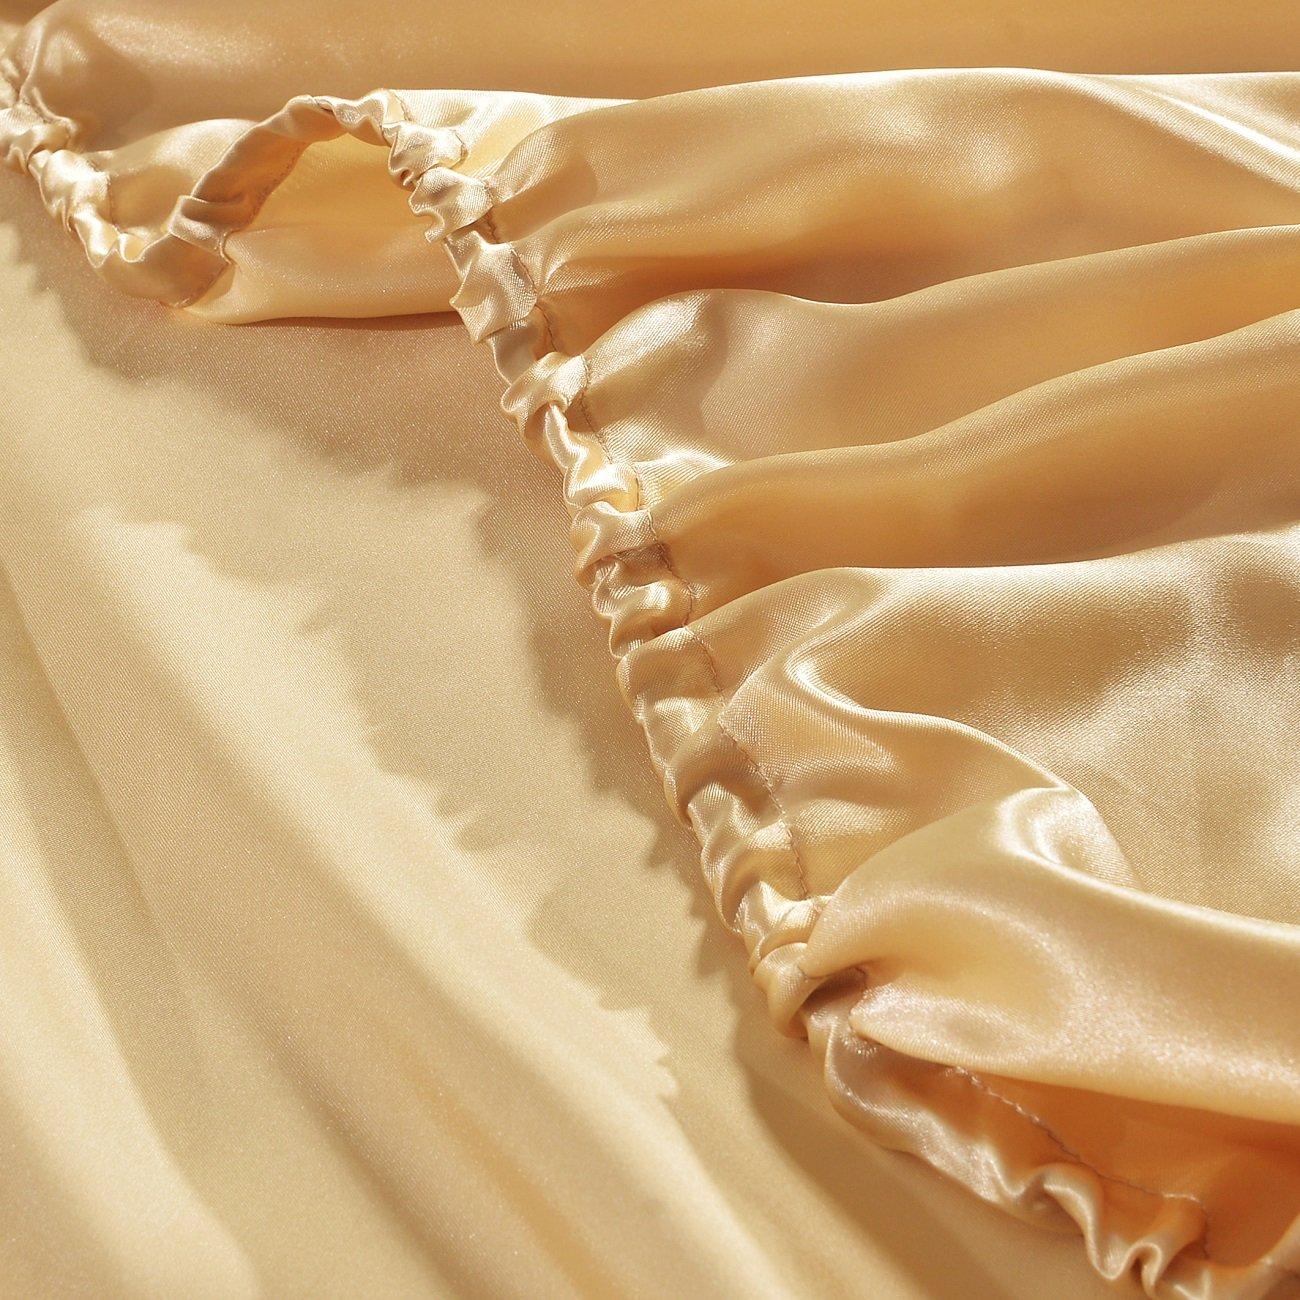 sat/én Colch/ón con goma el/ástica. liso Varios Tama/ños, sat/én, beige, 160 x 200 cm HYSENM s/ábana